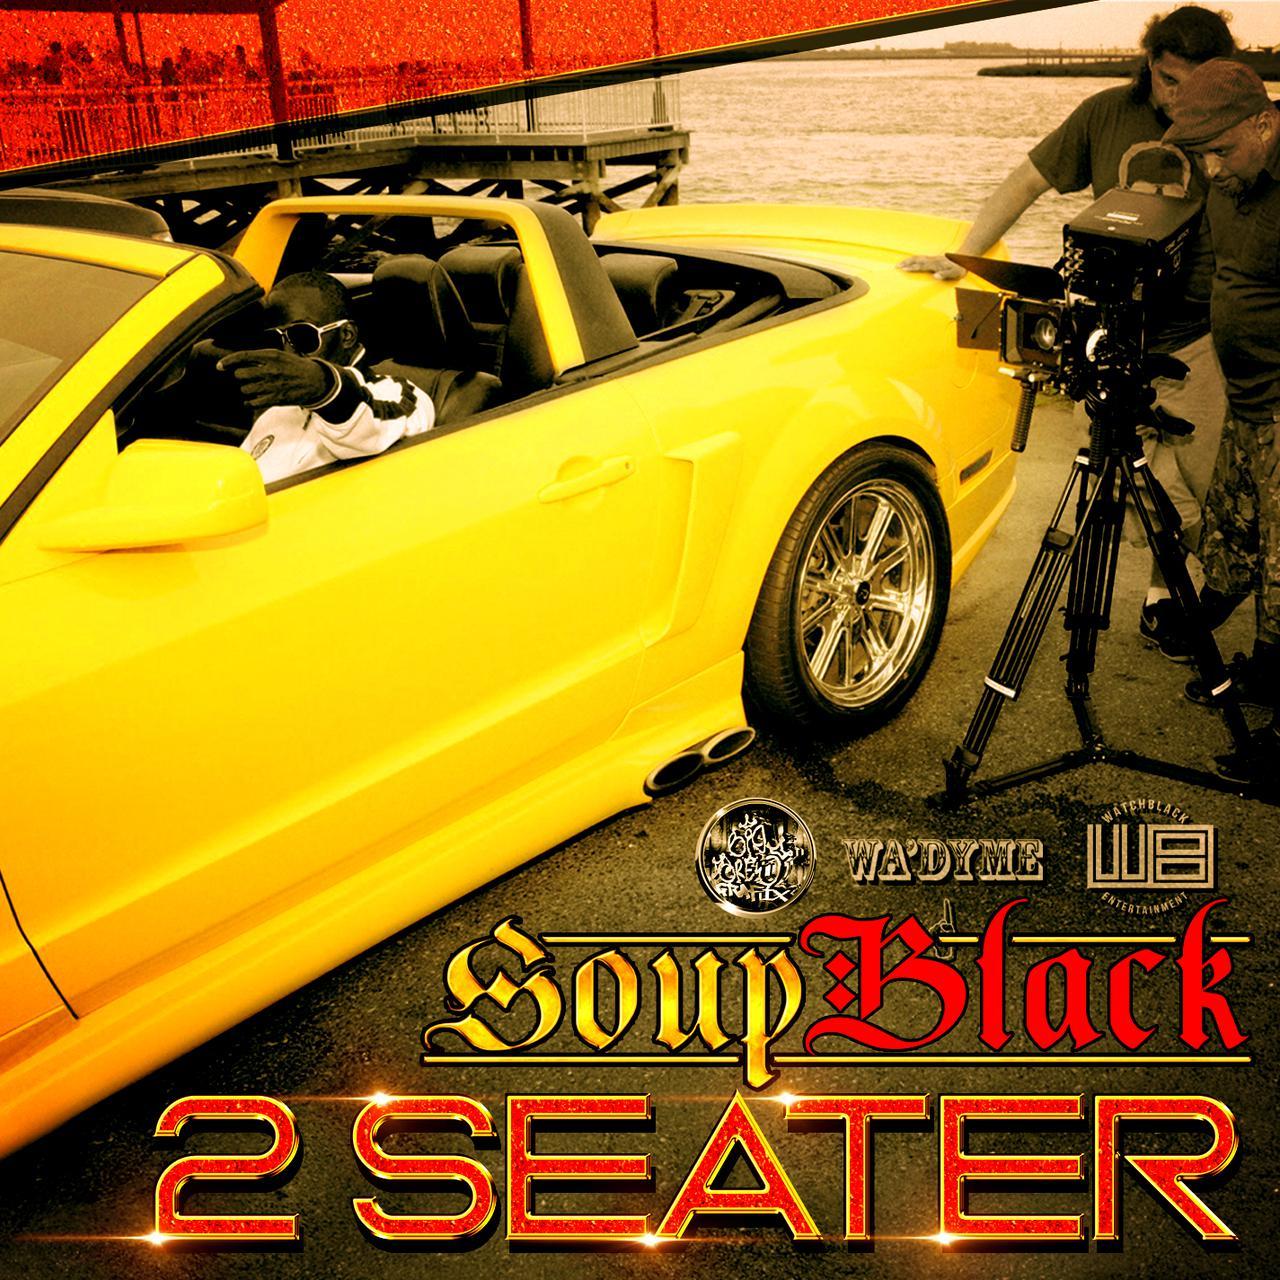 imageGallery/SoupBlack 2 Seater Cover BDG 080218.JPG